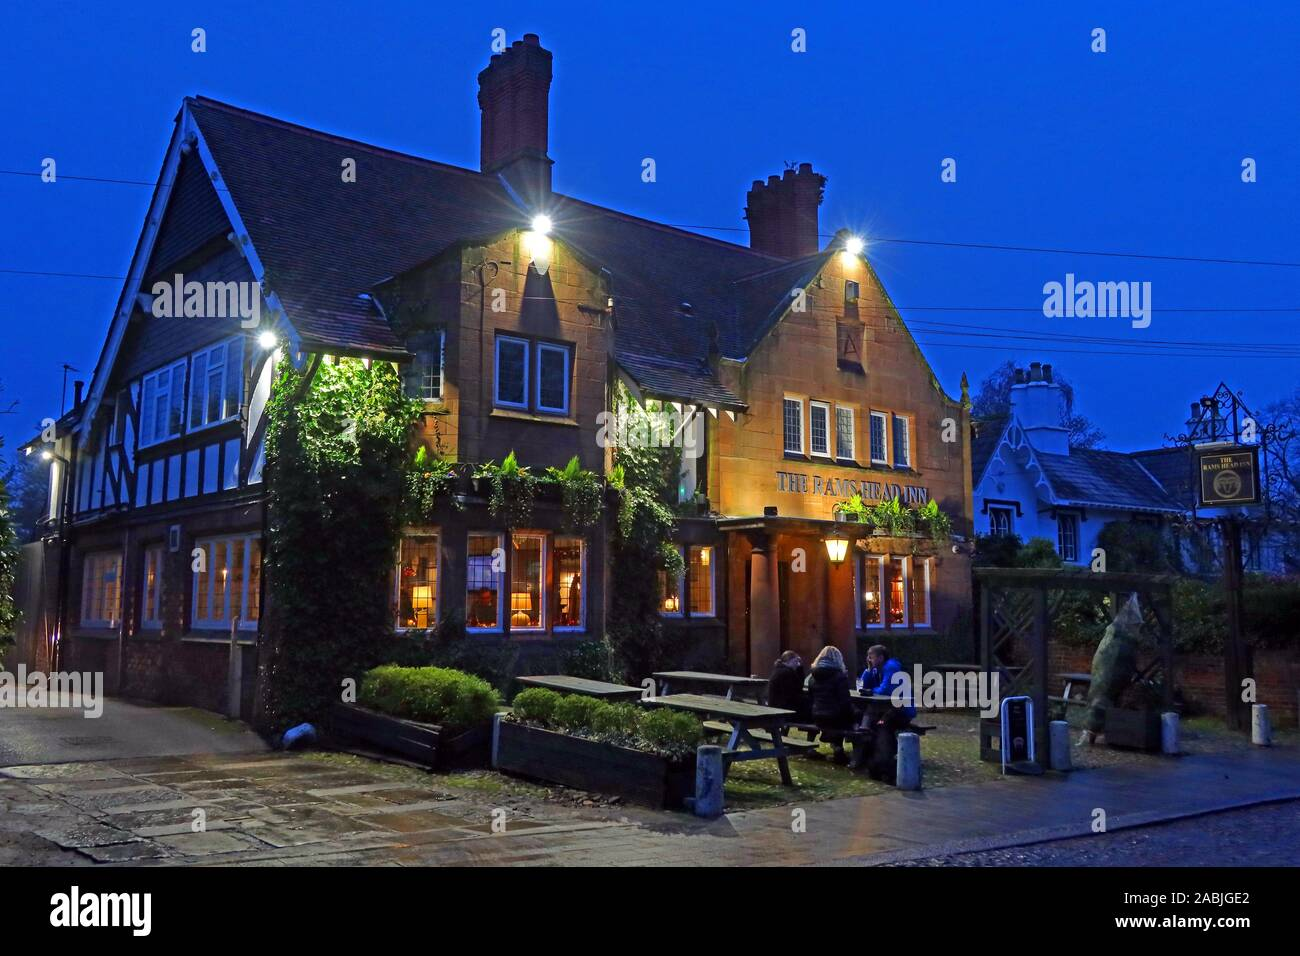 Dieses Stockfoto: Rams Head Pub, Church Lane, Grappenhall, Warrington, Cheshire, England, UK, WA4 3EP, in der Dämmerung - 2ABJGE